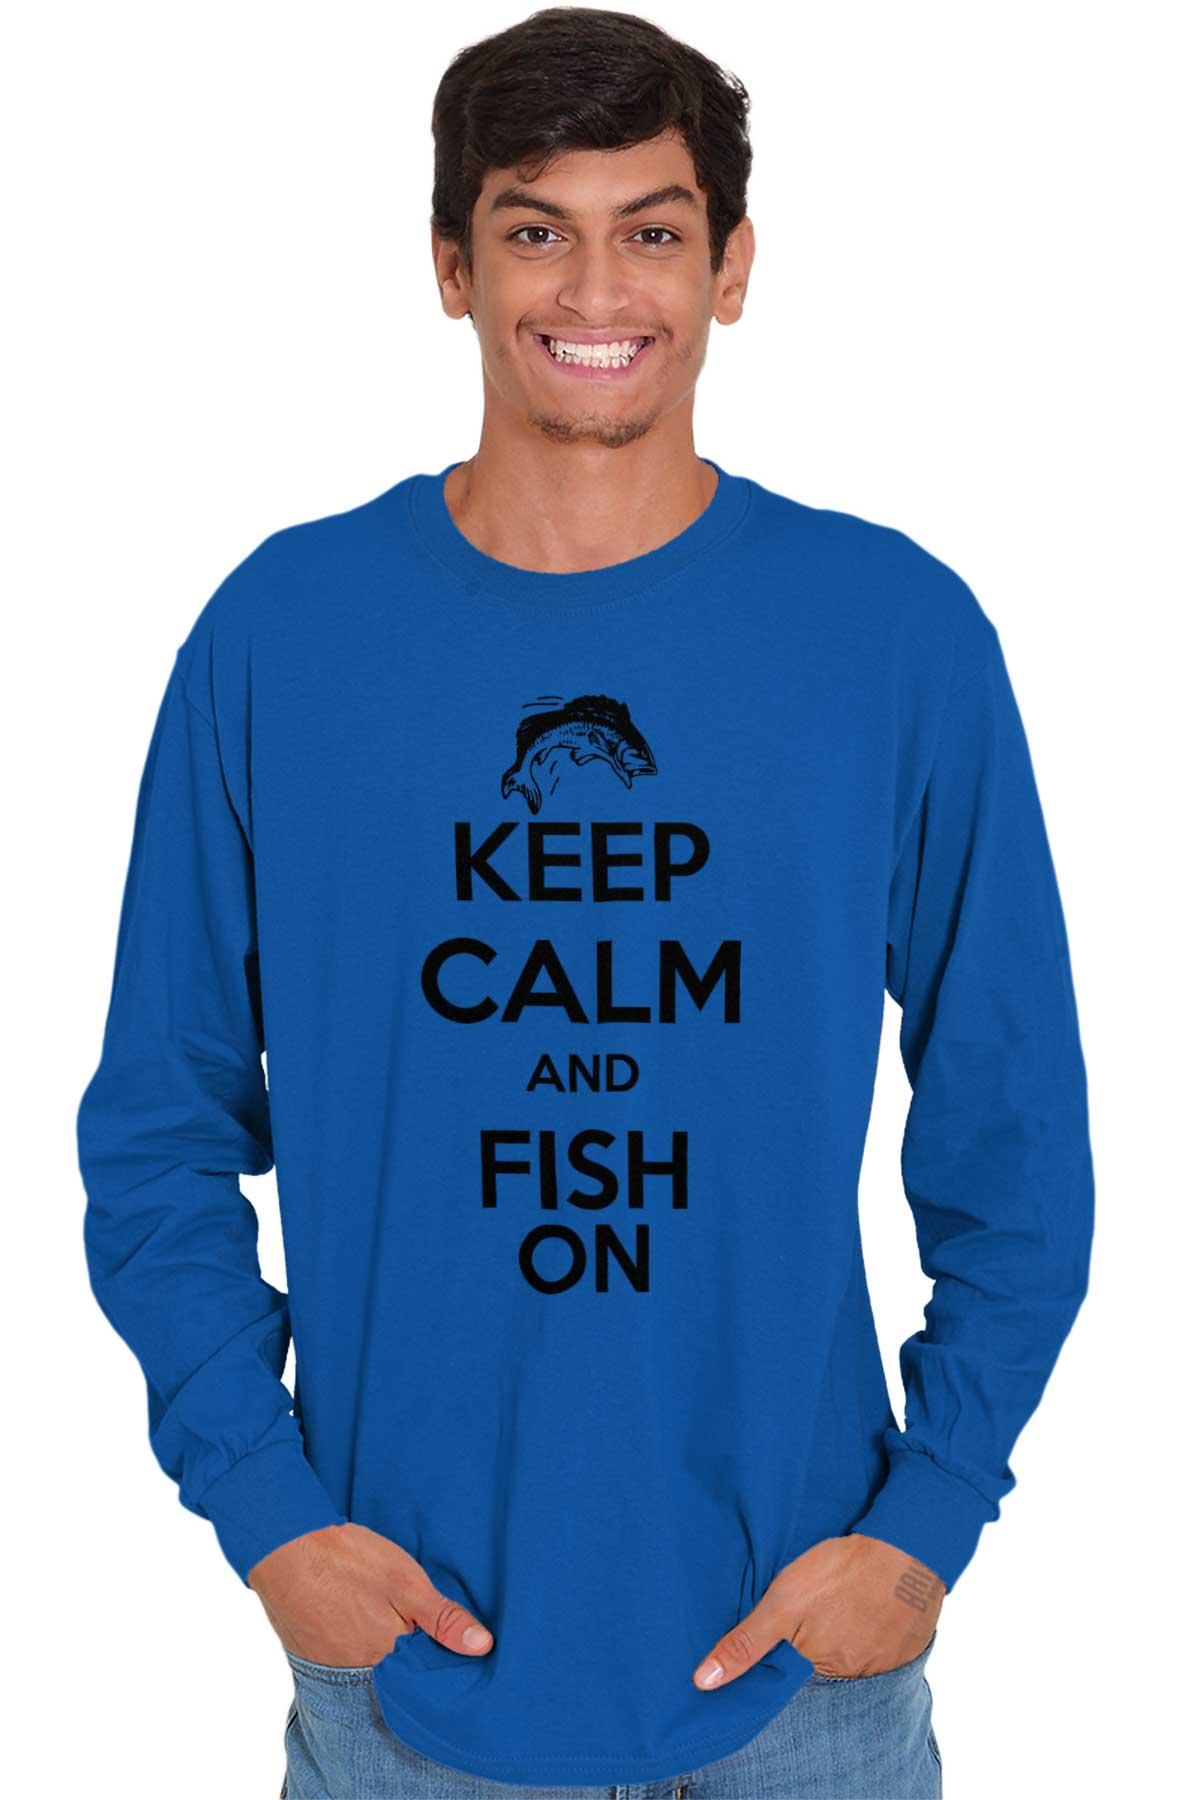 Mens Keep Calm And Fish On T Shirt Funny Tshirt Fisherman Tee Going Fishing